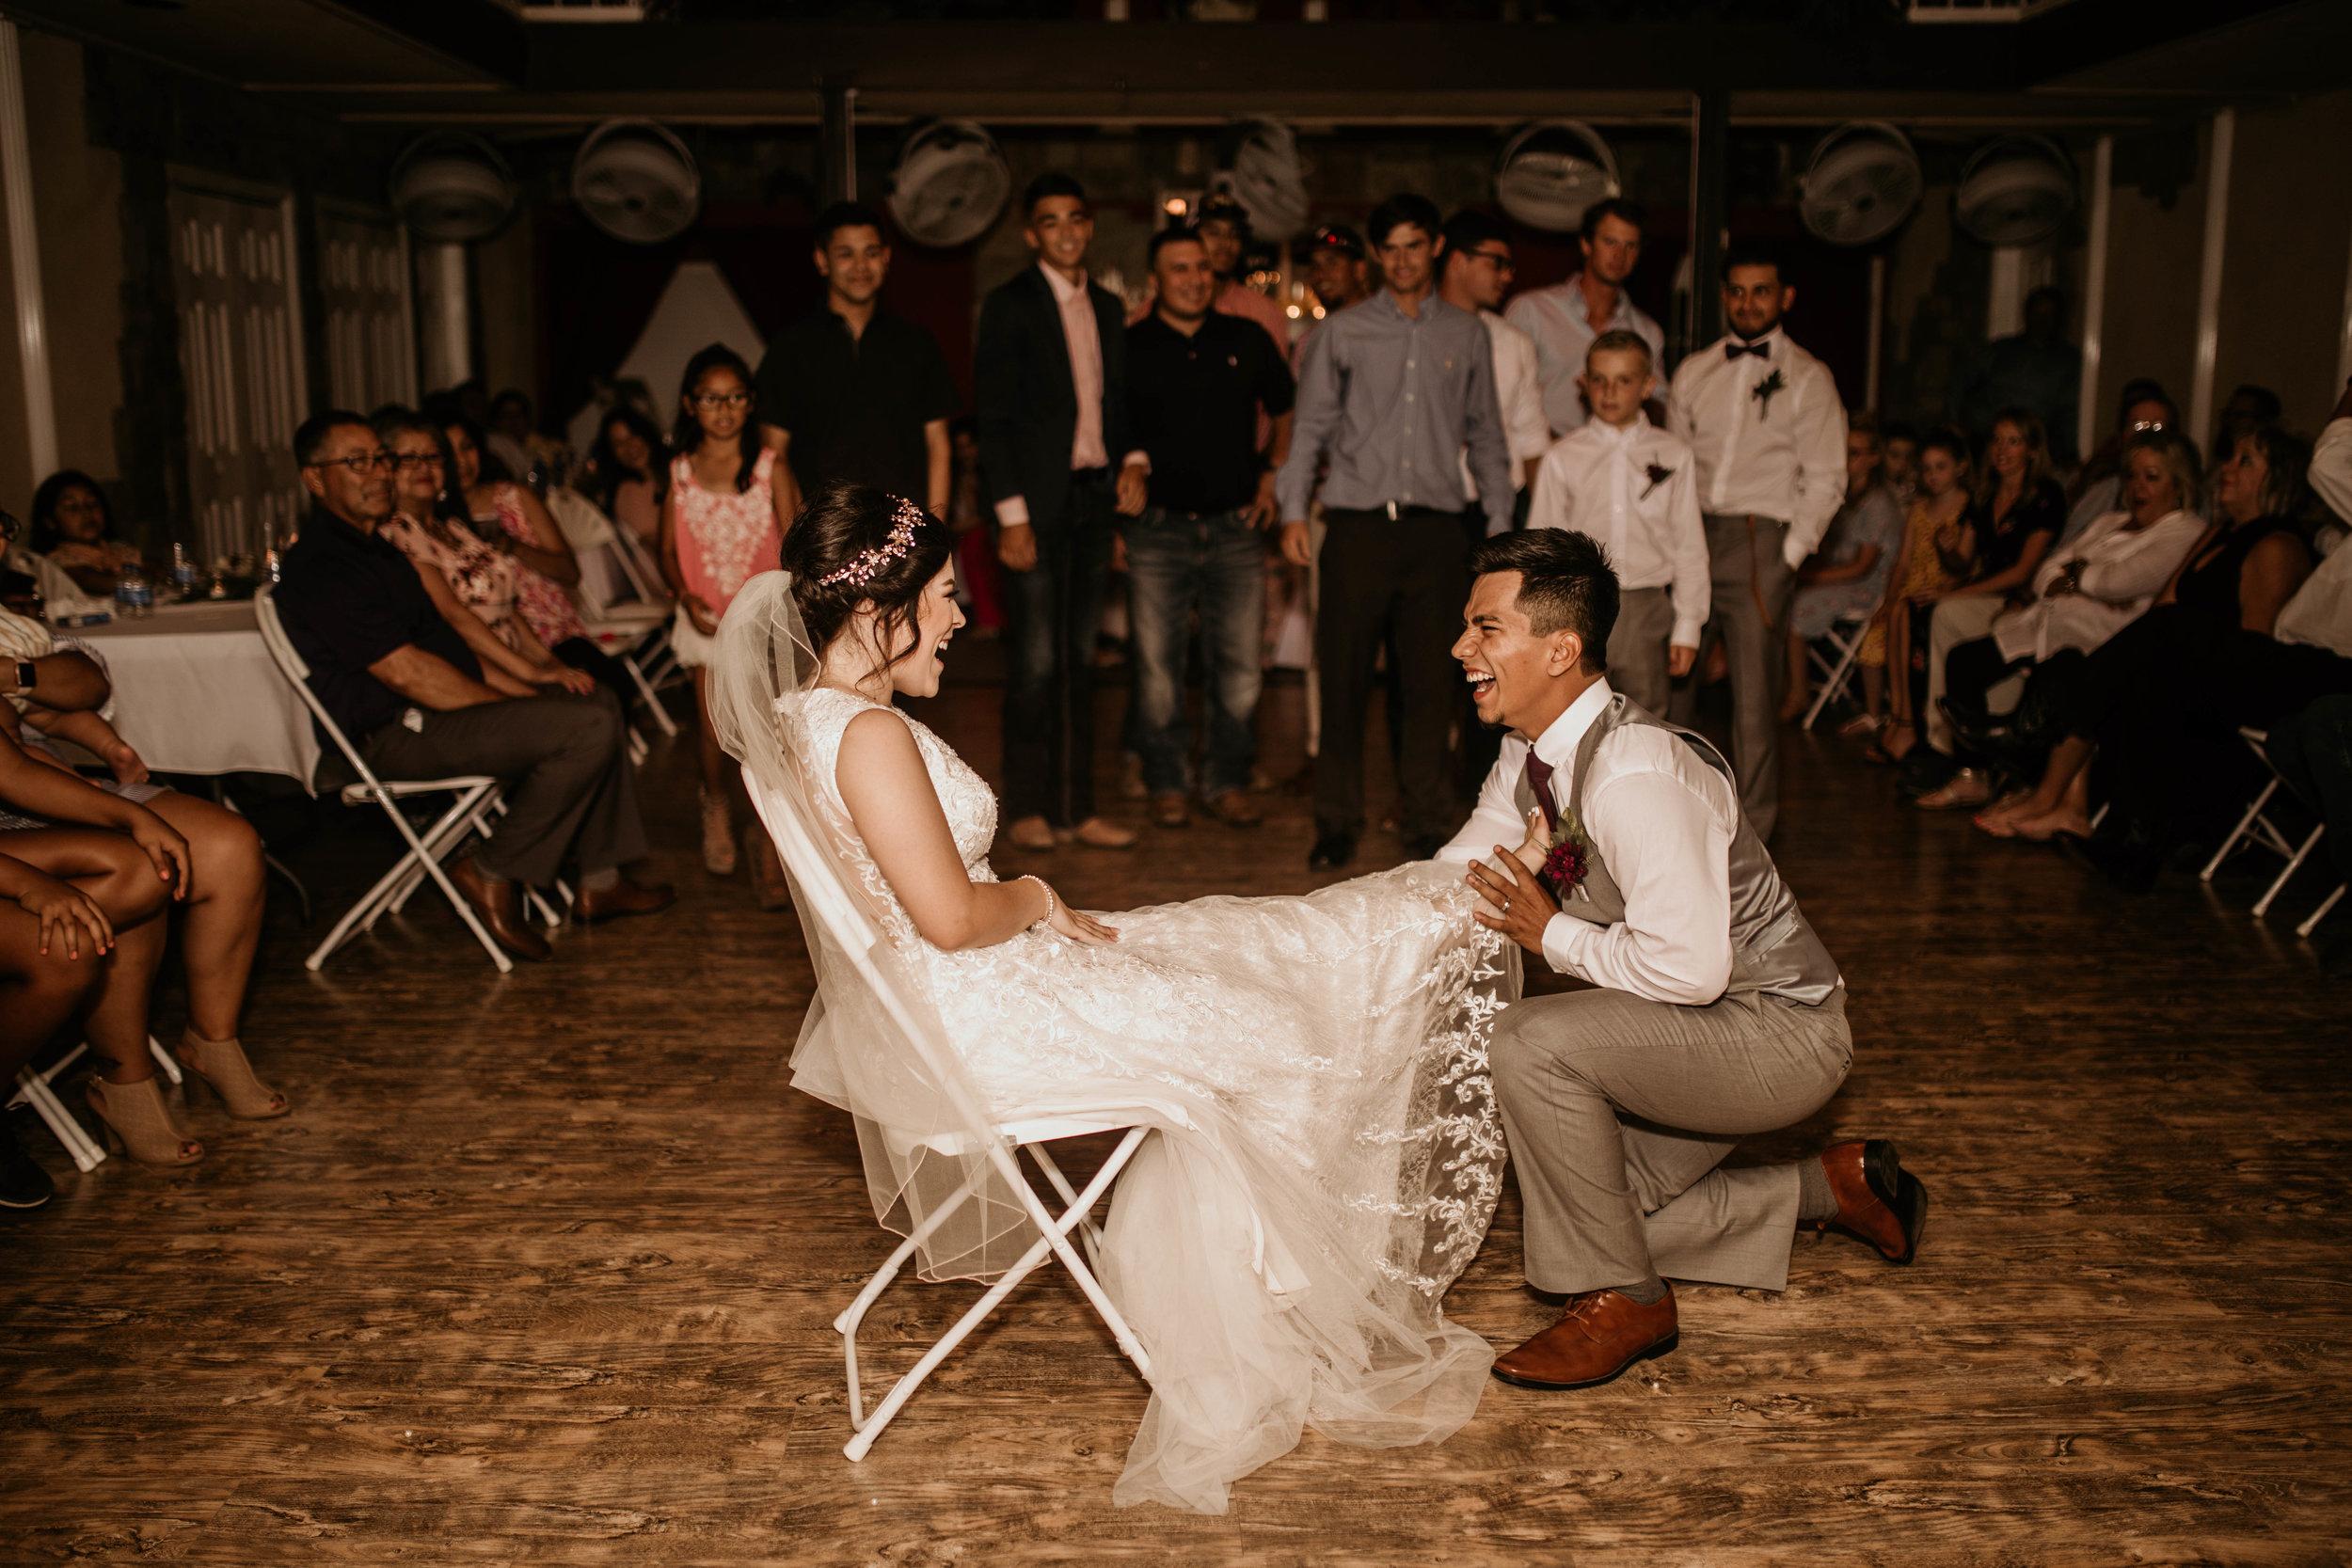 Lubbock,Texas WeddingDM7A1685.jpg